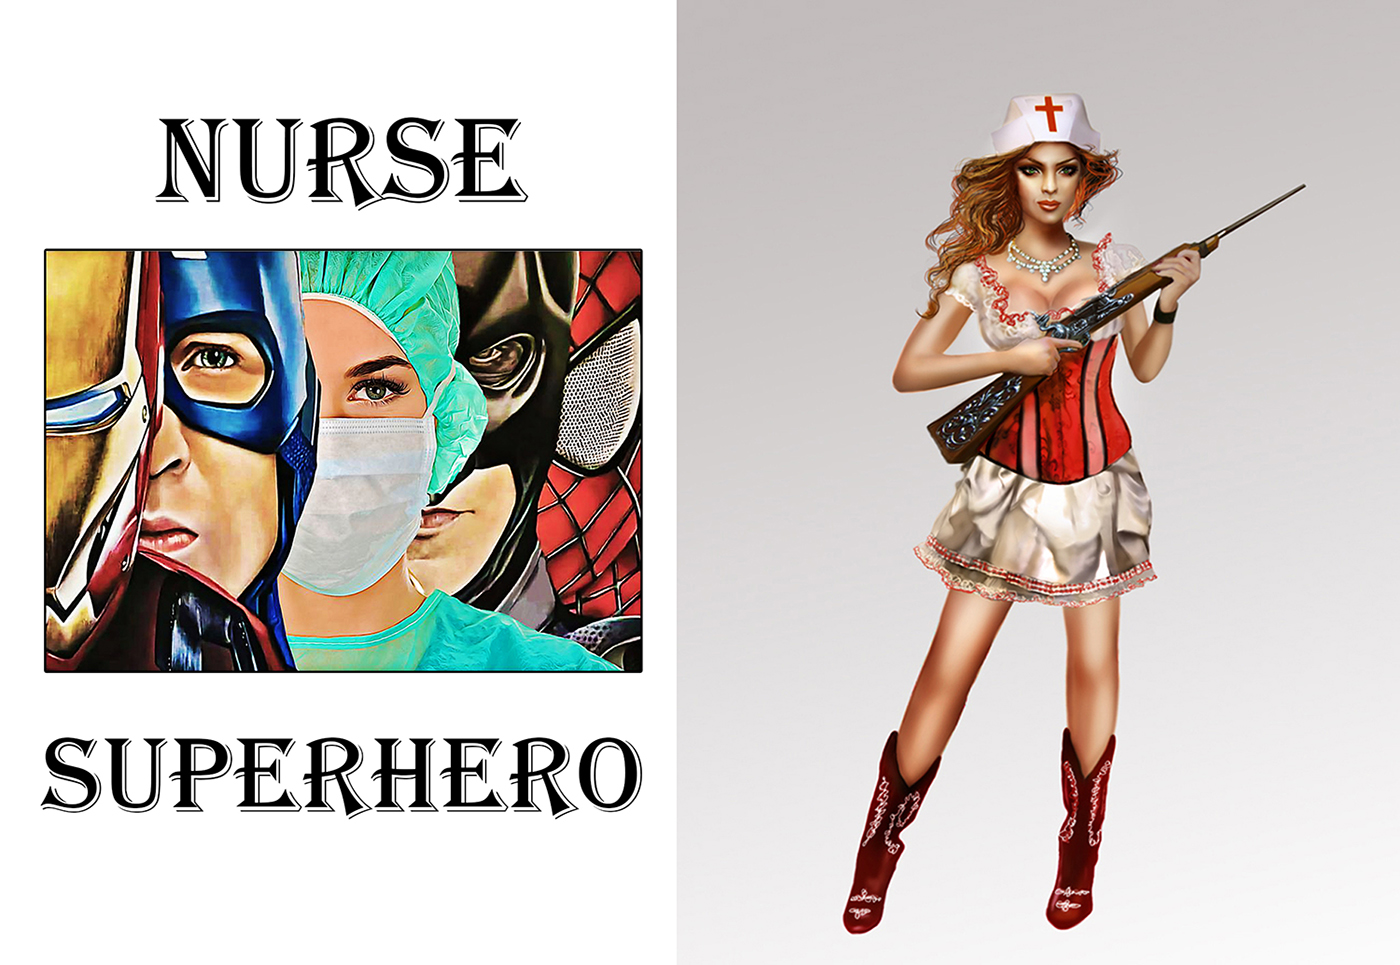 Nurse Superheroes Iron Man Poster a2